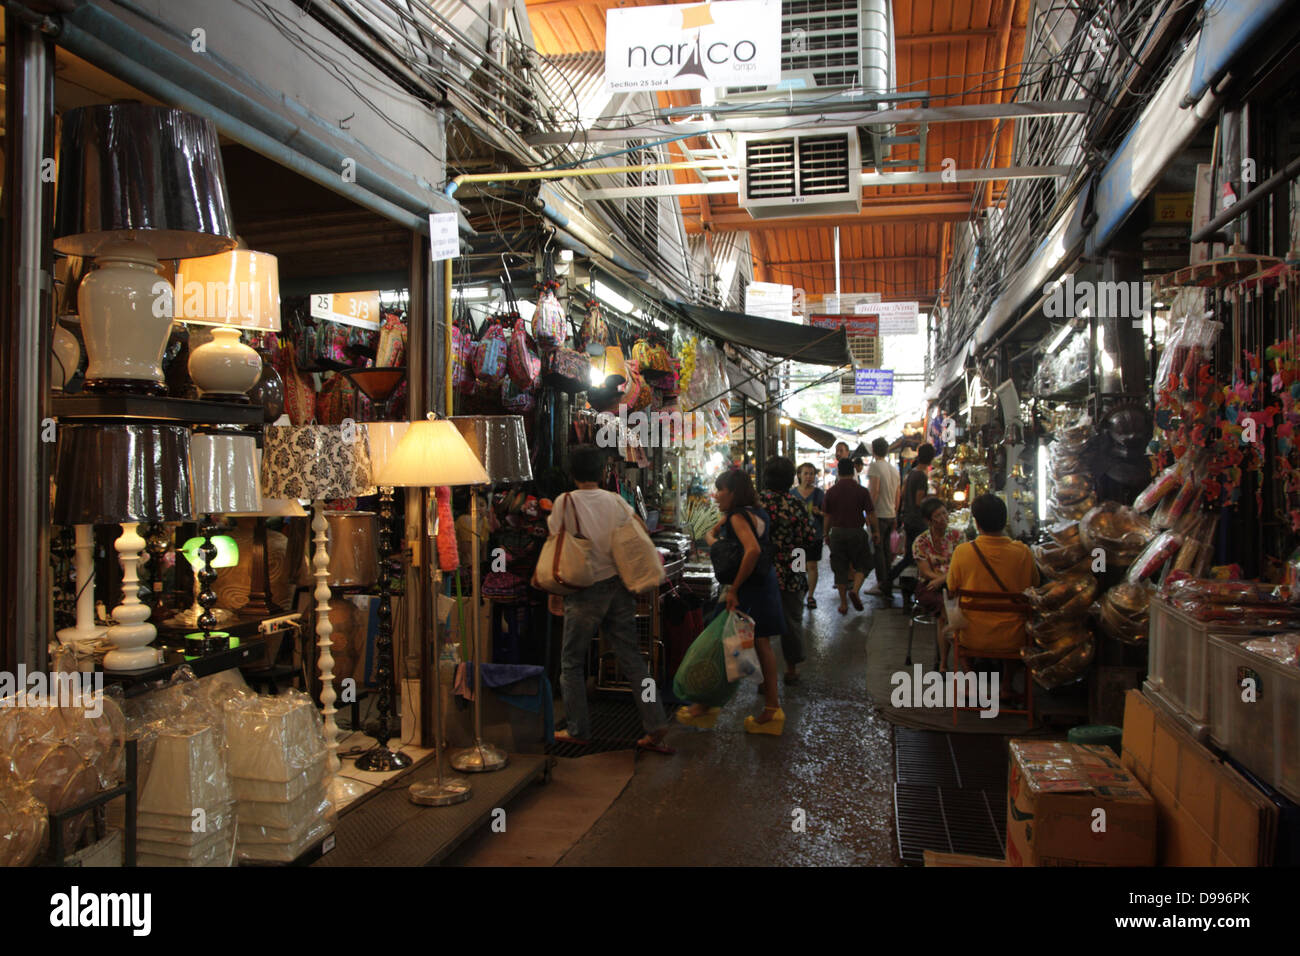 Walkway Near A Home Decor Shop At Chatuchak Weekend Market In Bangkok Stock Photo Royalty Free